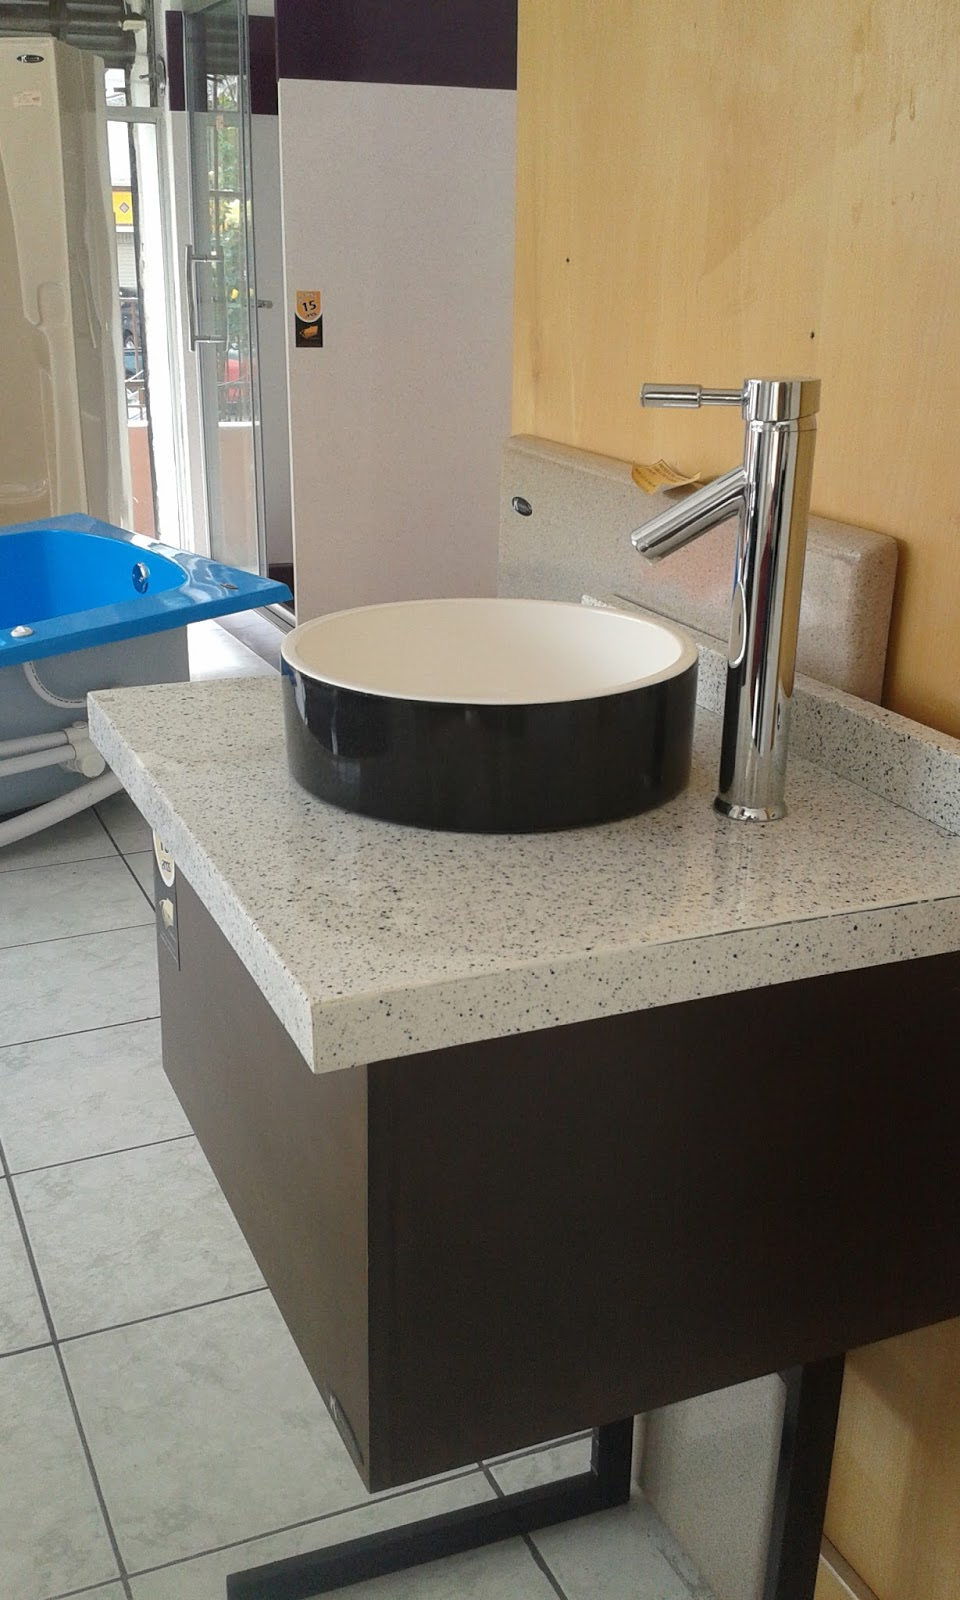 Disdecon muebles de cocina y ba o for Granito brasileno colores